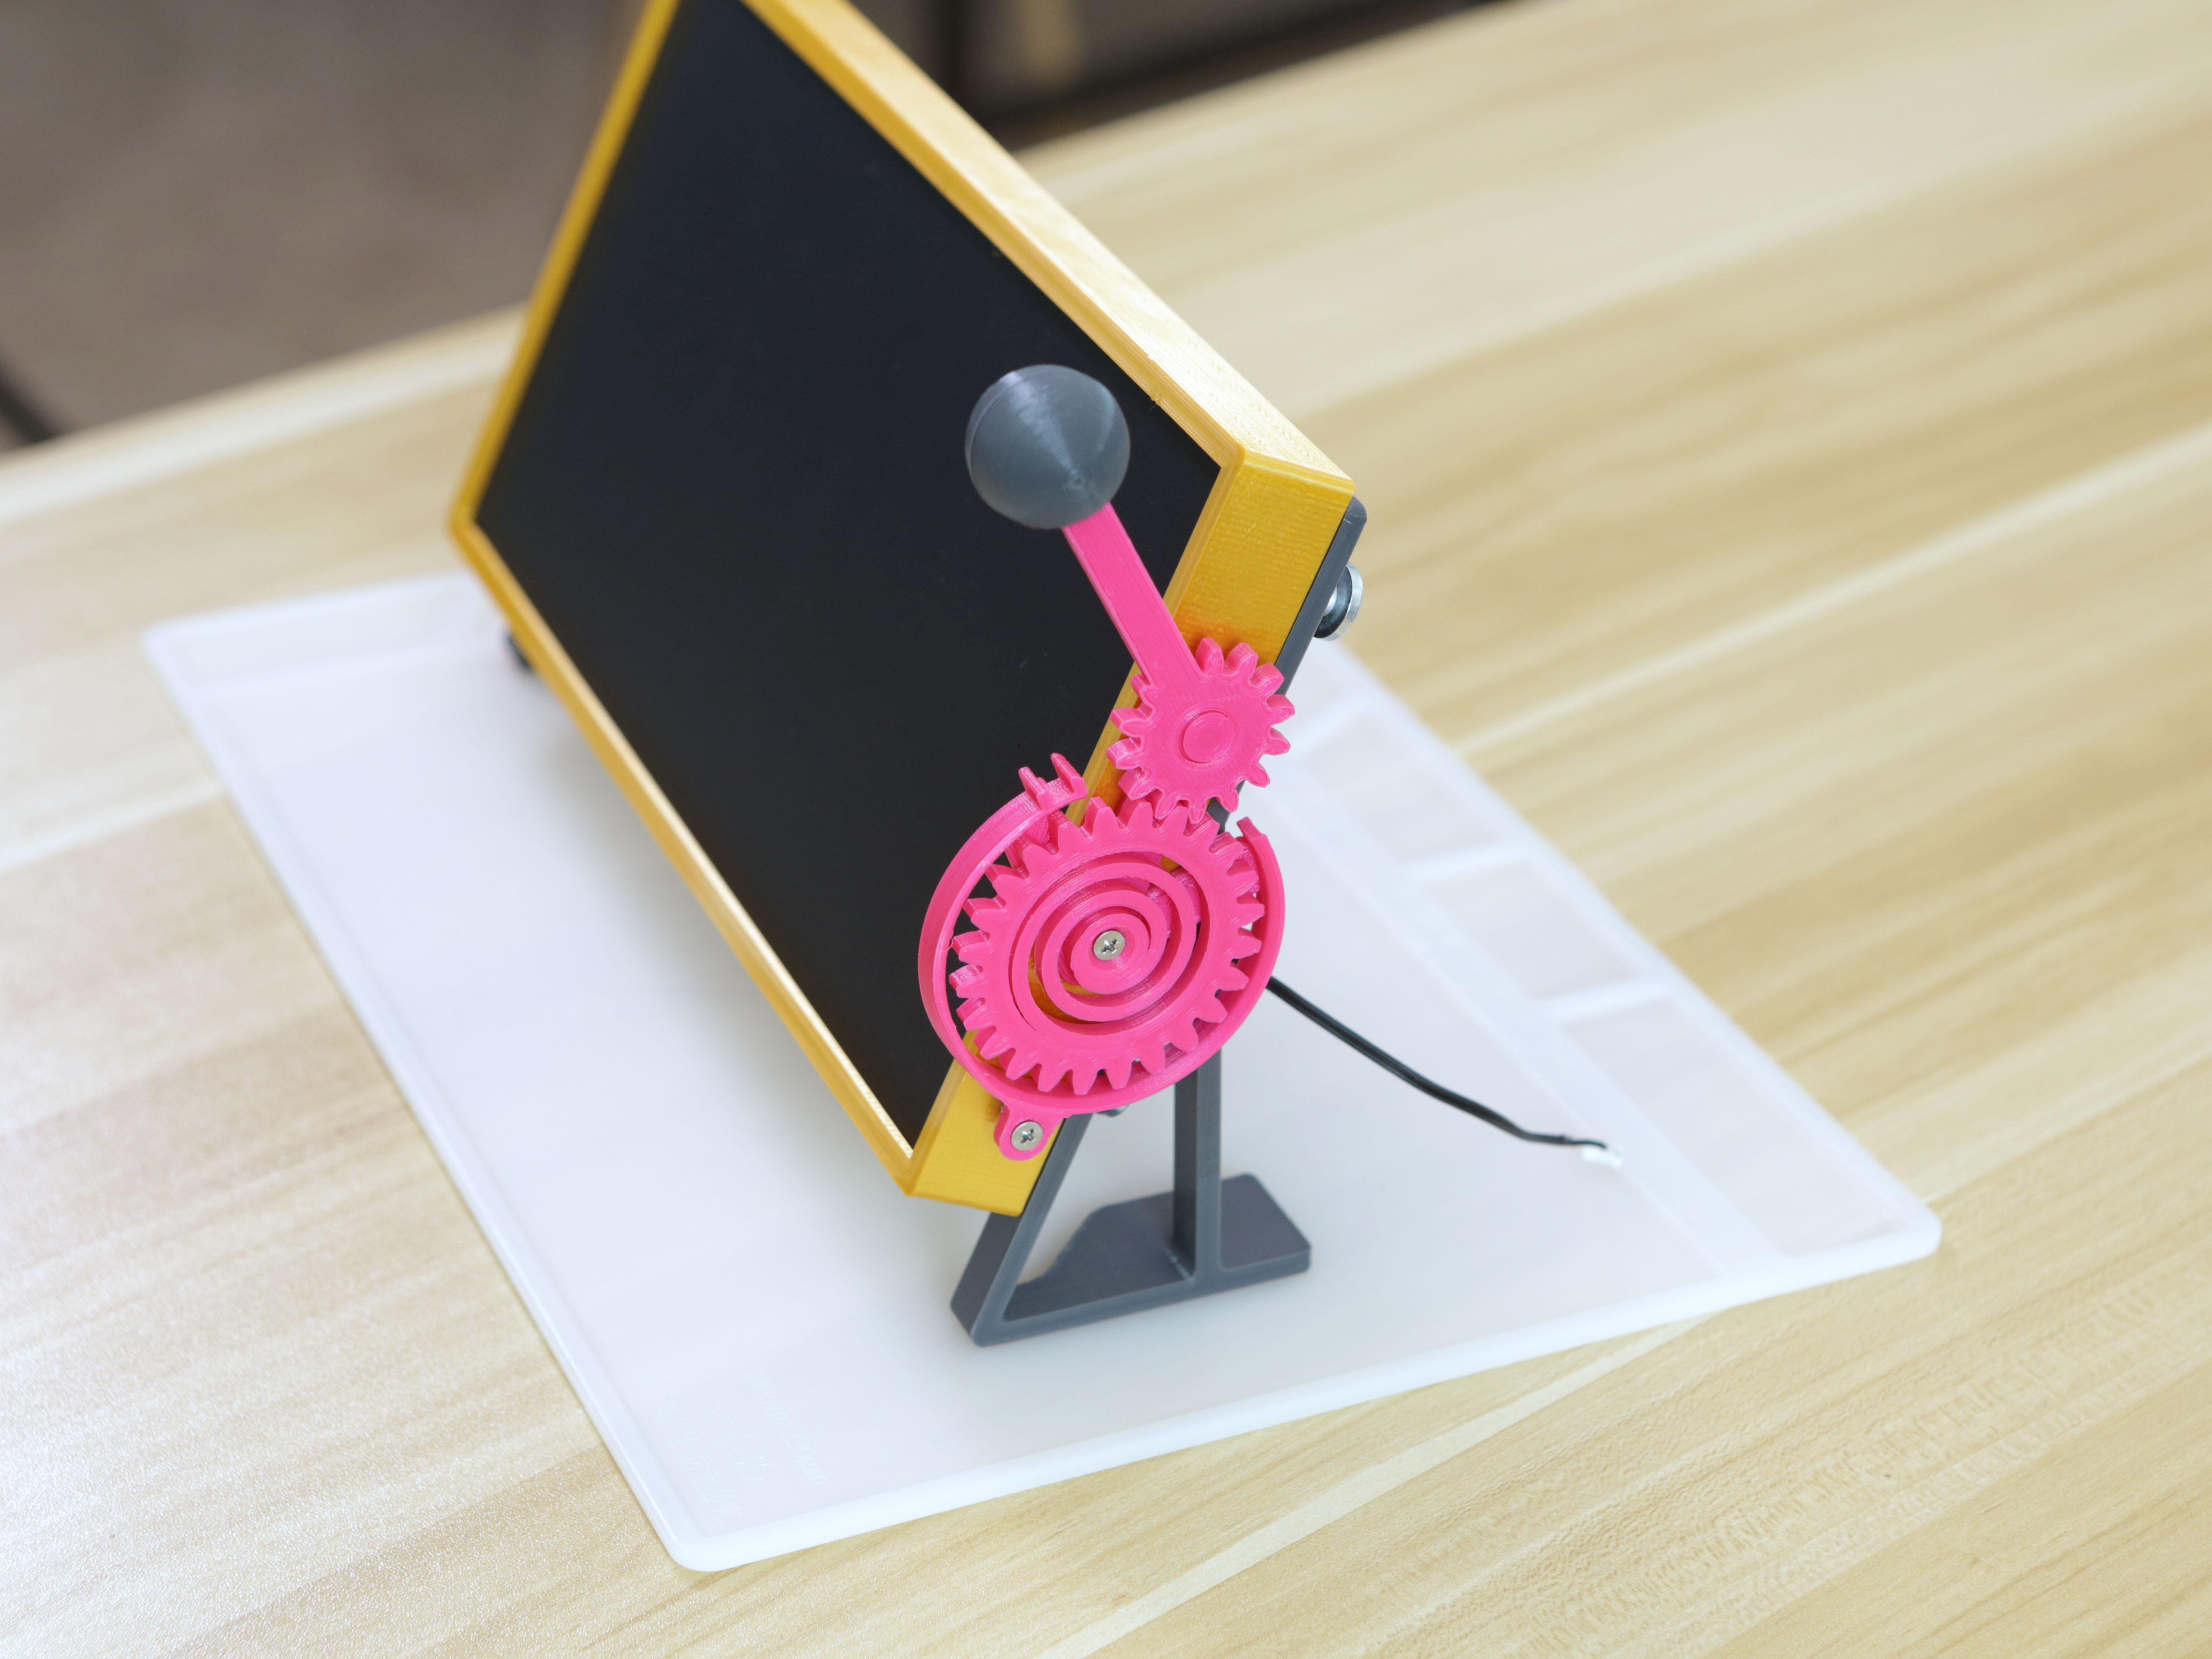 3d_printing_installed-handle-frame.jpg